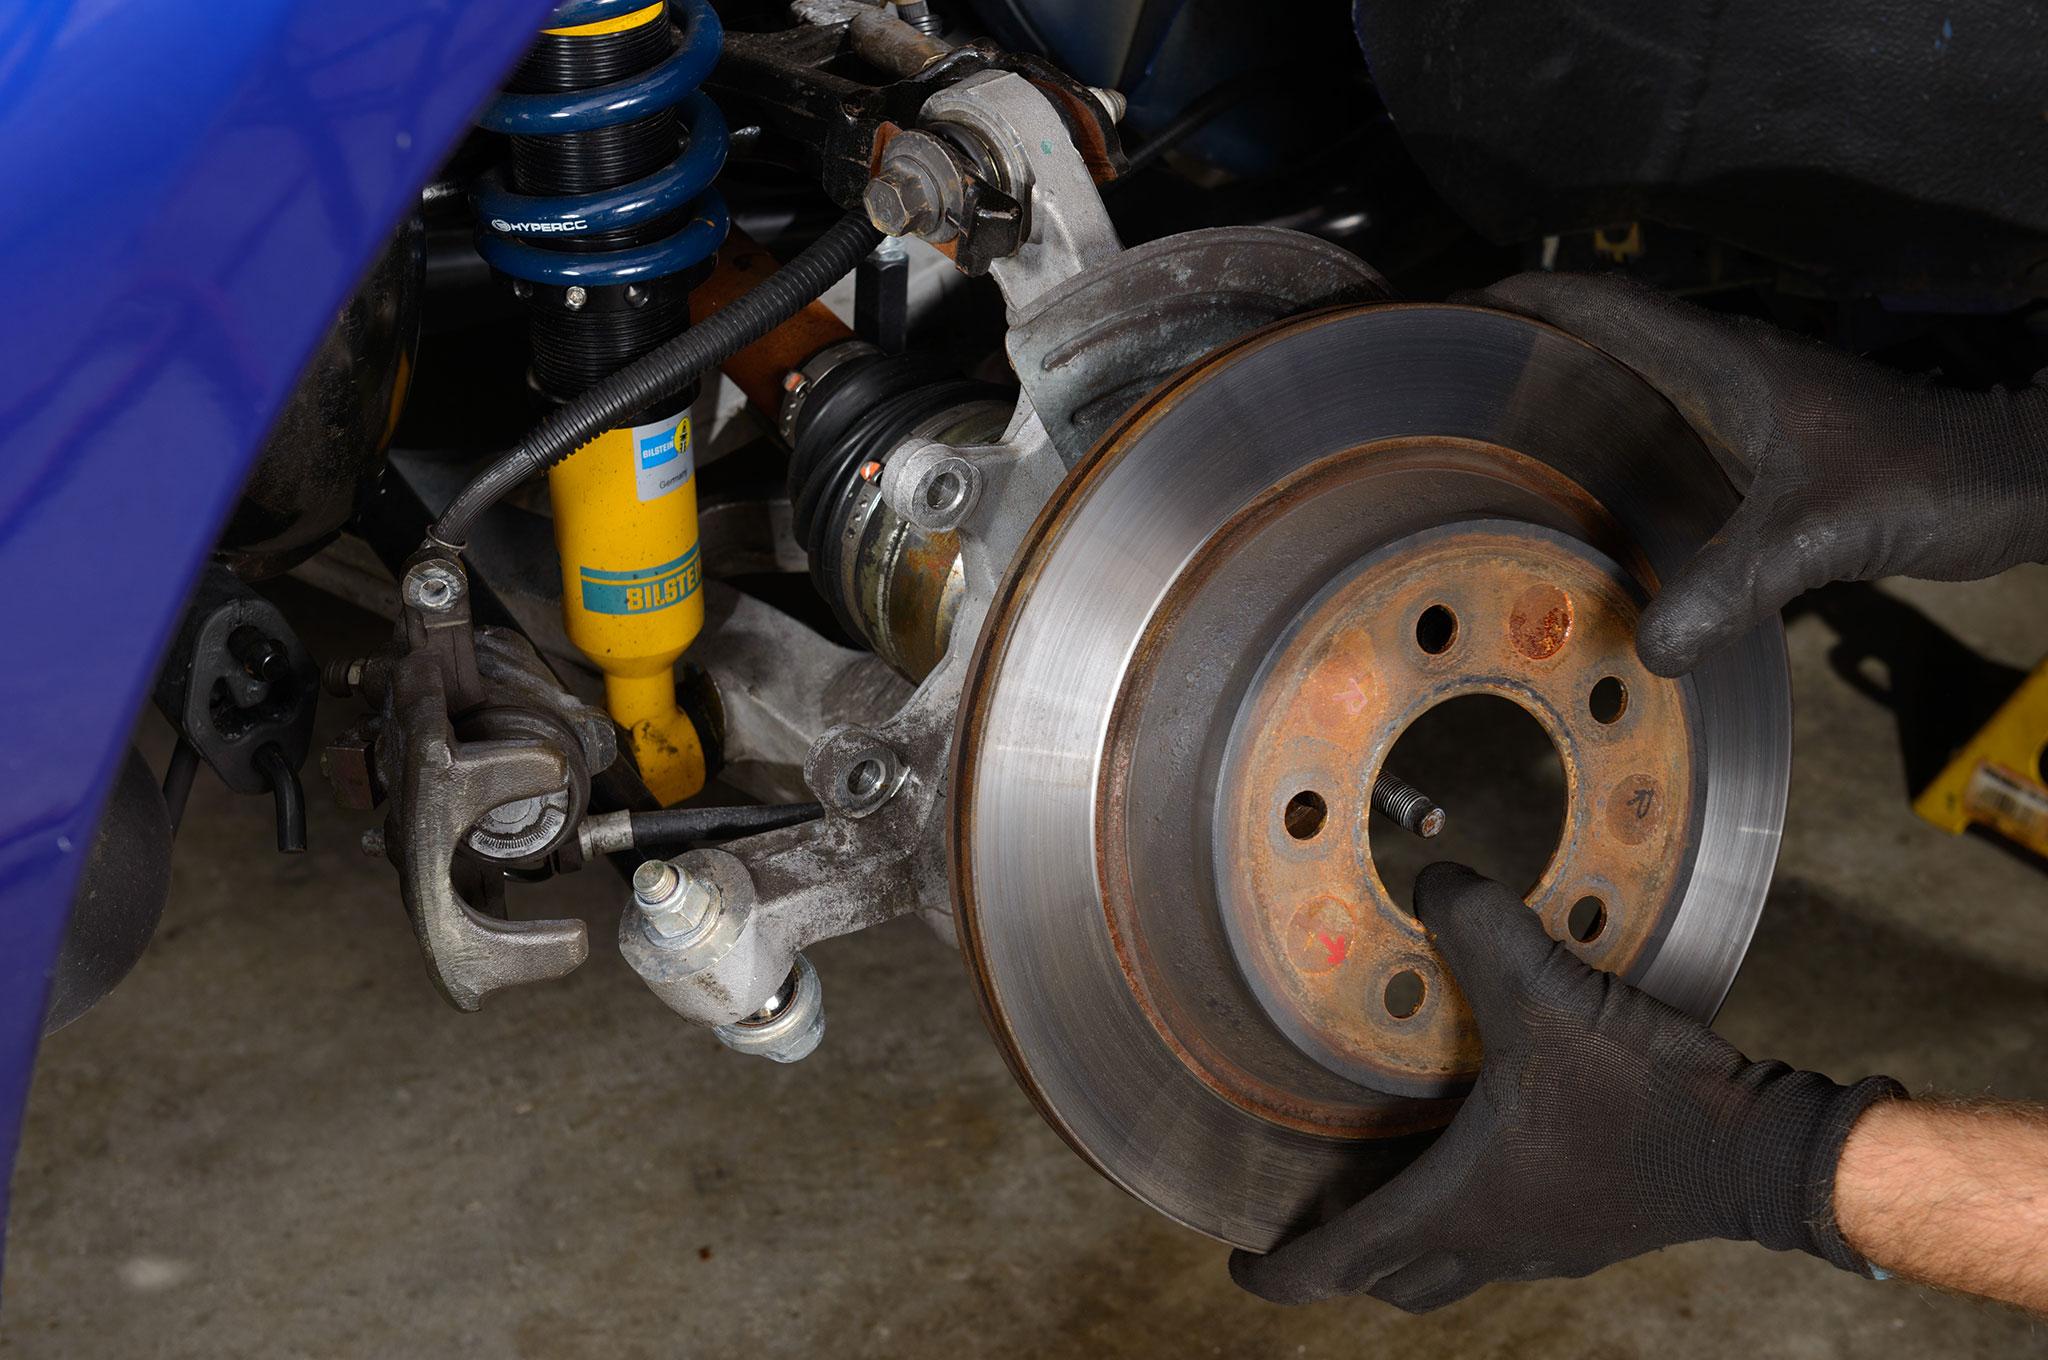 05 2003 Ford Mustang Cobra Removing Brake Rotor